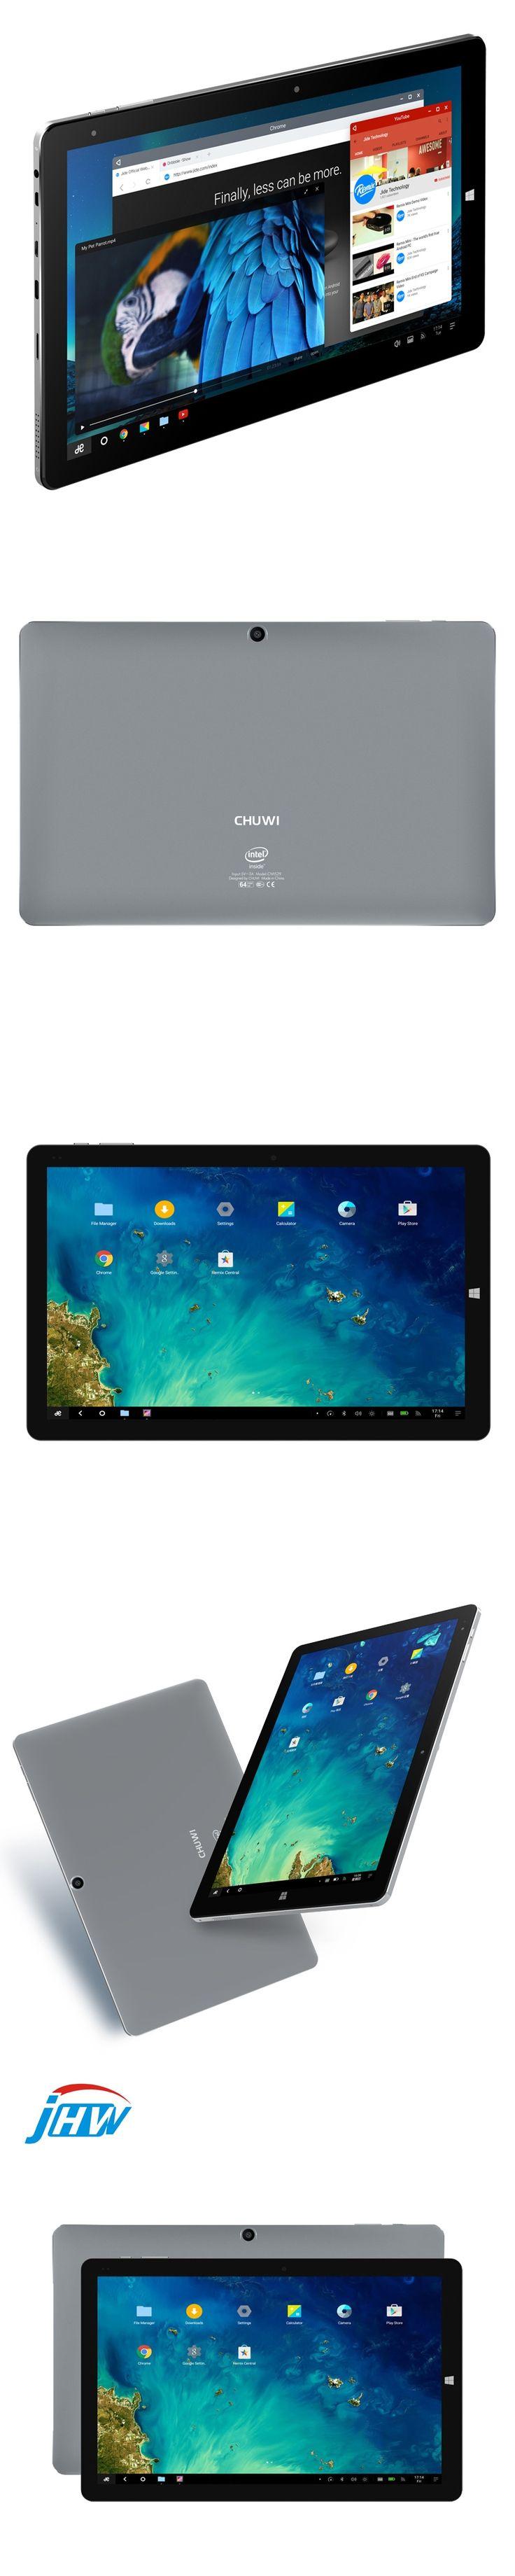 "chuwi Hi10 Pro Dual OS 10.1"" 2in1 Tablet PC Intel Cherry Trail Z8350 Windows 10 & Android 5.1 4G RAM 64G ROM 1920x1200Type-C 3.0"